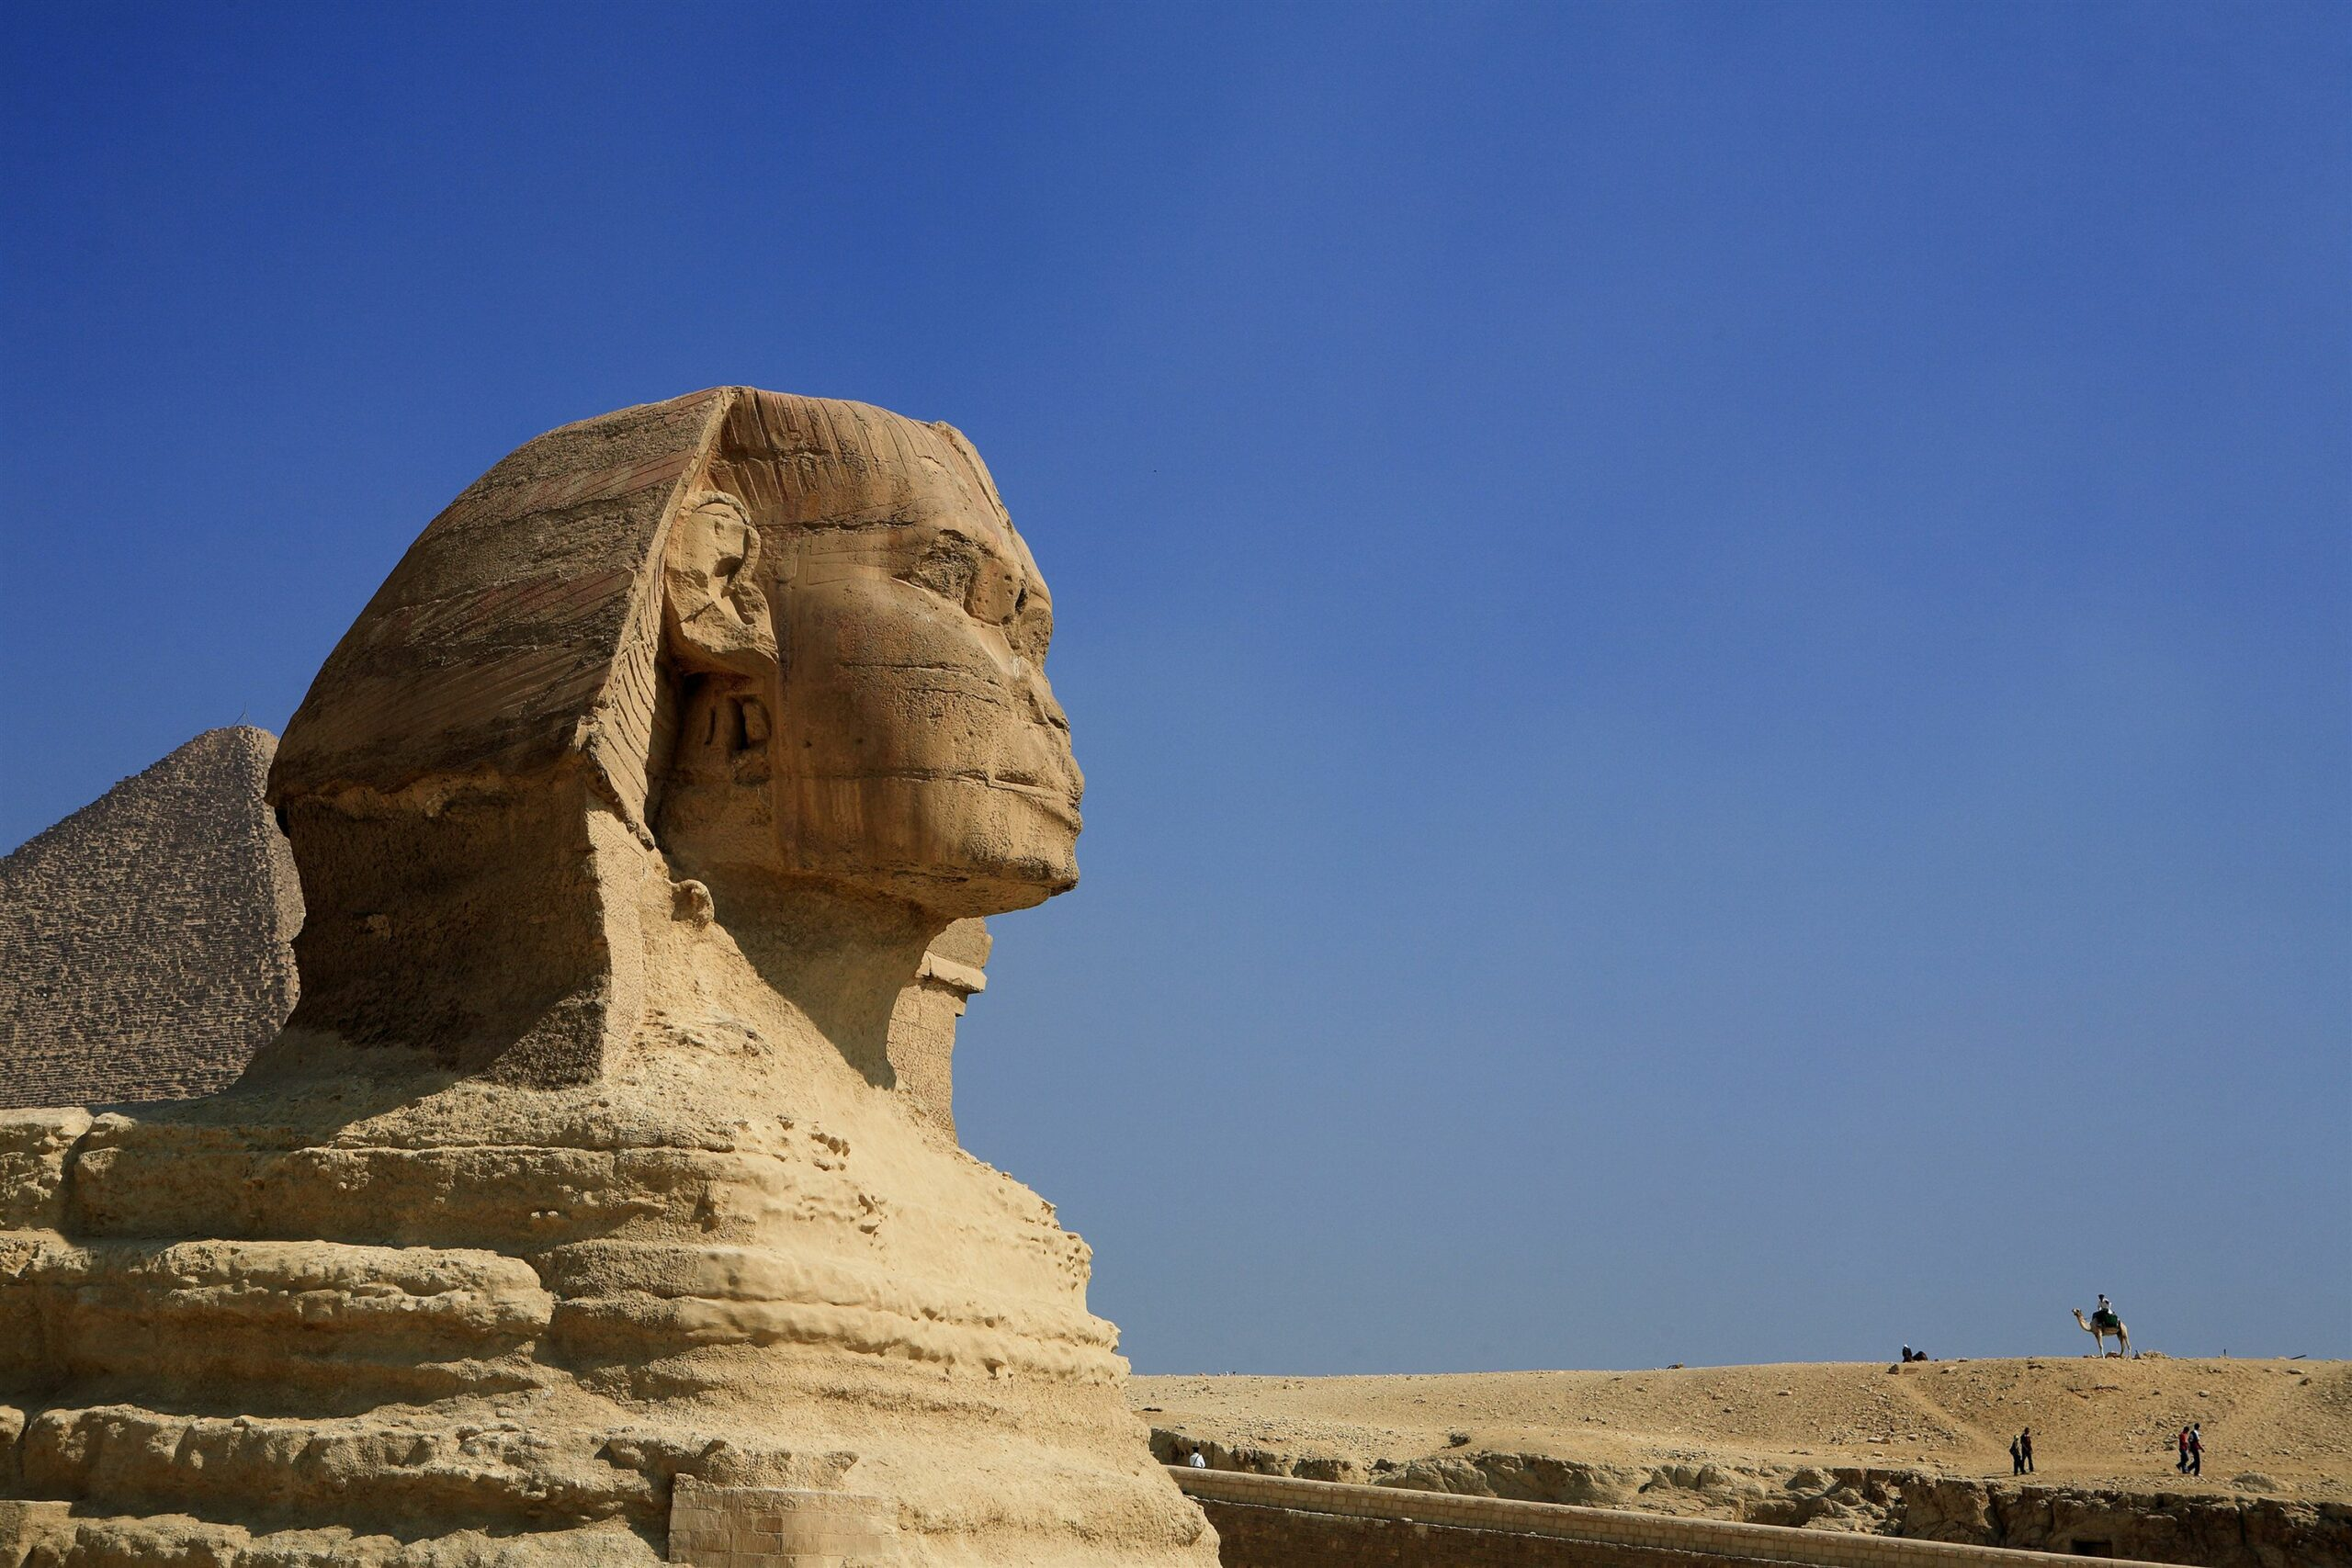 Sphinx in Cairo Egypt